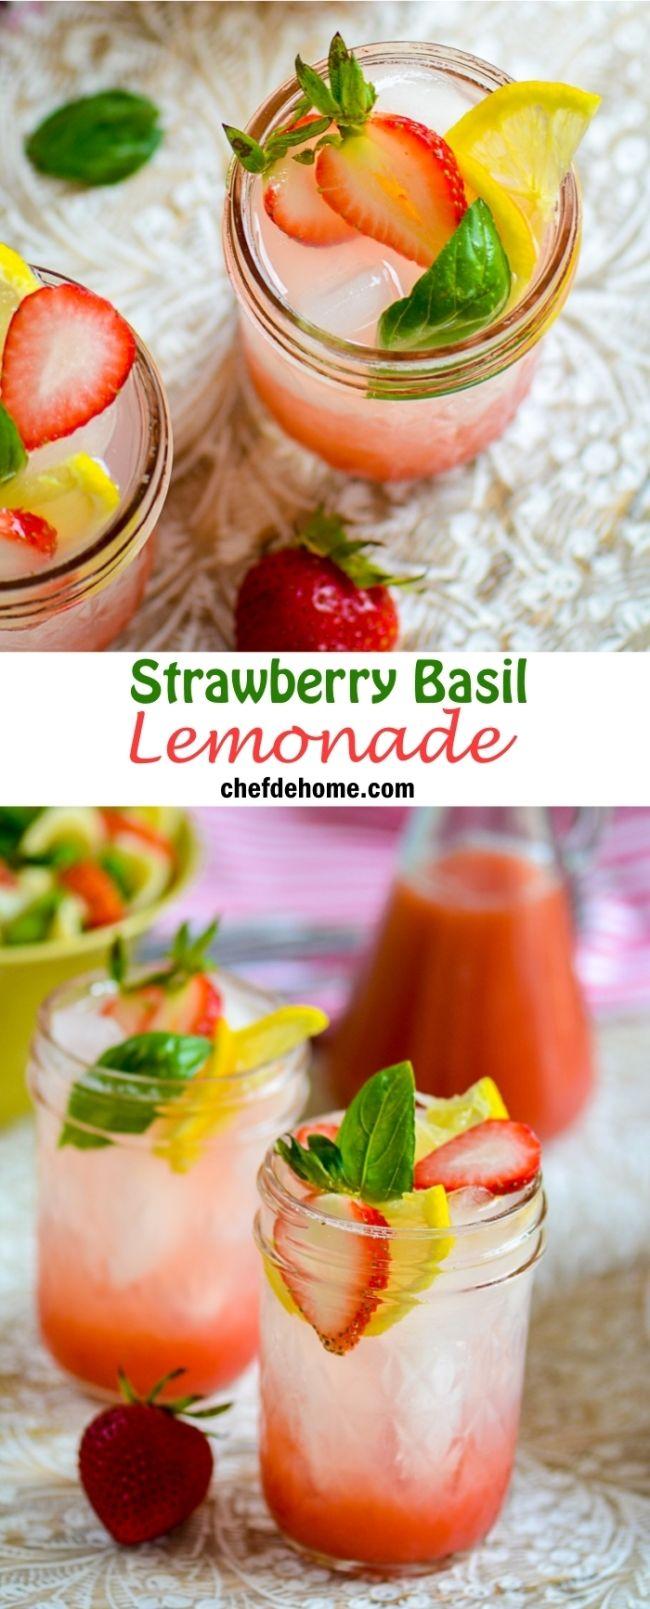 Easy Refreshing Fruity Strawberry Basil Lemonade | chefdehome.com